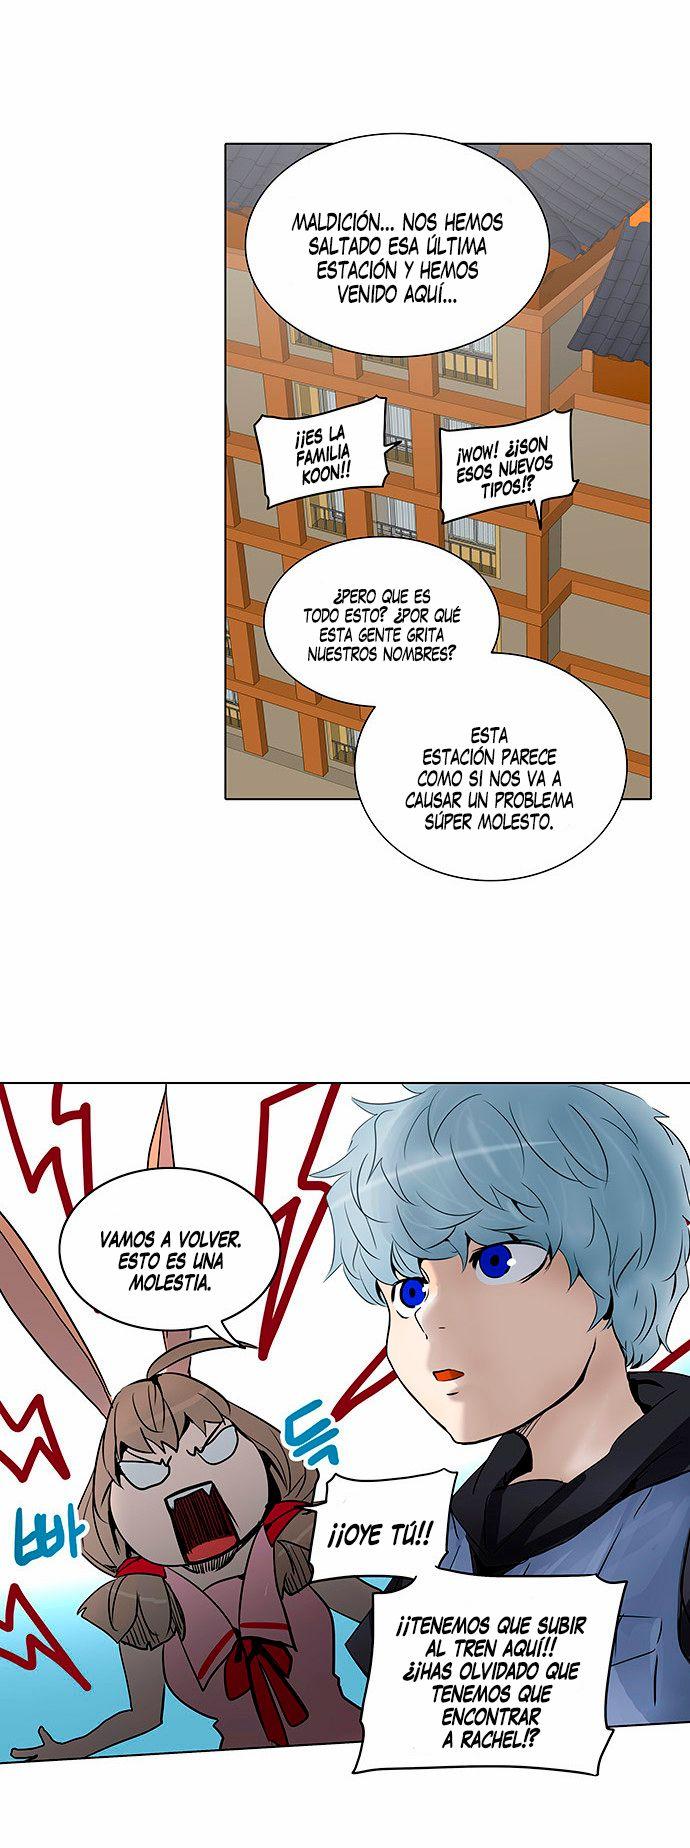 http://c5.ninemanga.com/es_manga/21/149/464053/0b219574097e4c96fa3860a84c1ec1e0.jpg Page 7